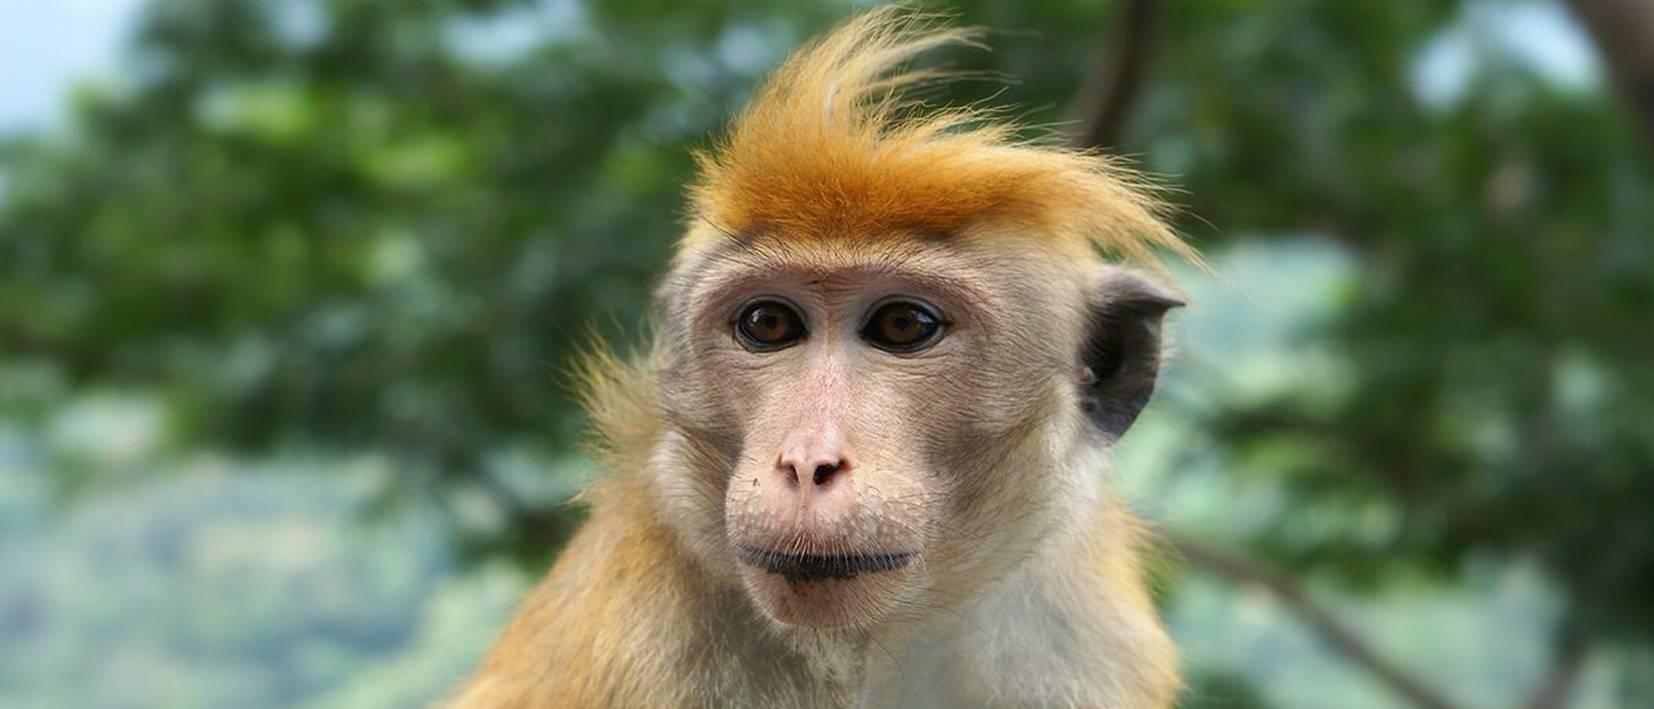 monkey's face, orange fur